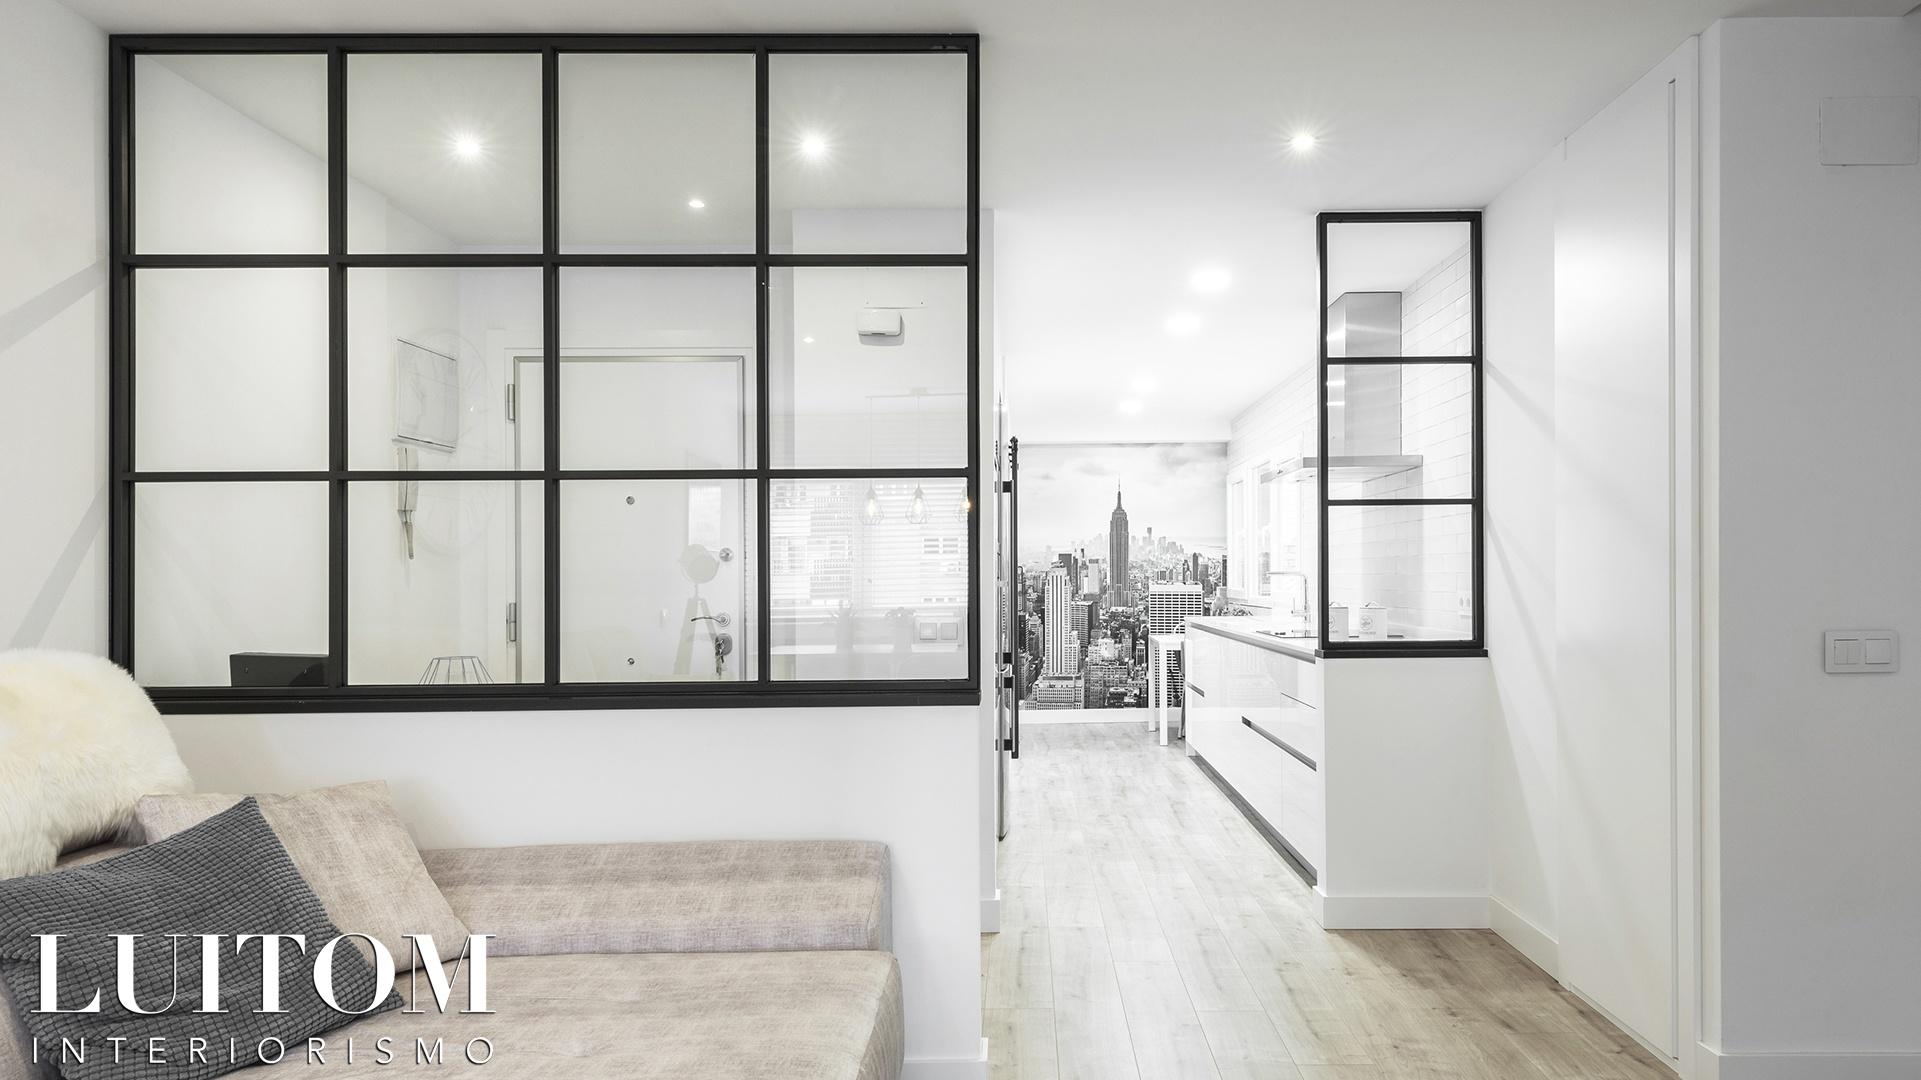 cristaleras-cocinas-pared-cristal-separacion-cocina-salon-cristalera-metalica-madera-blanca-negra-19